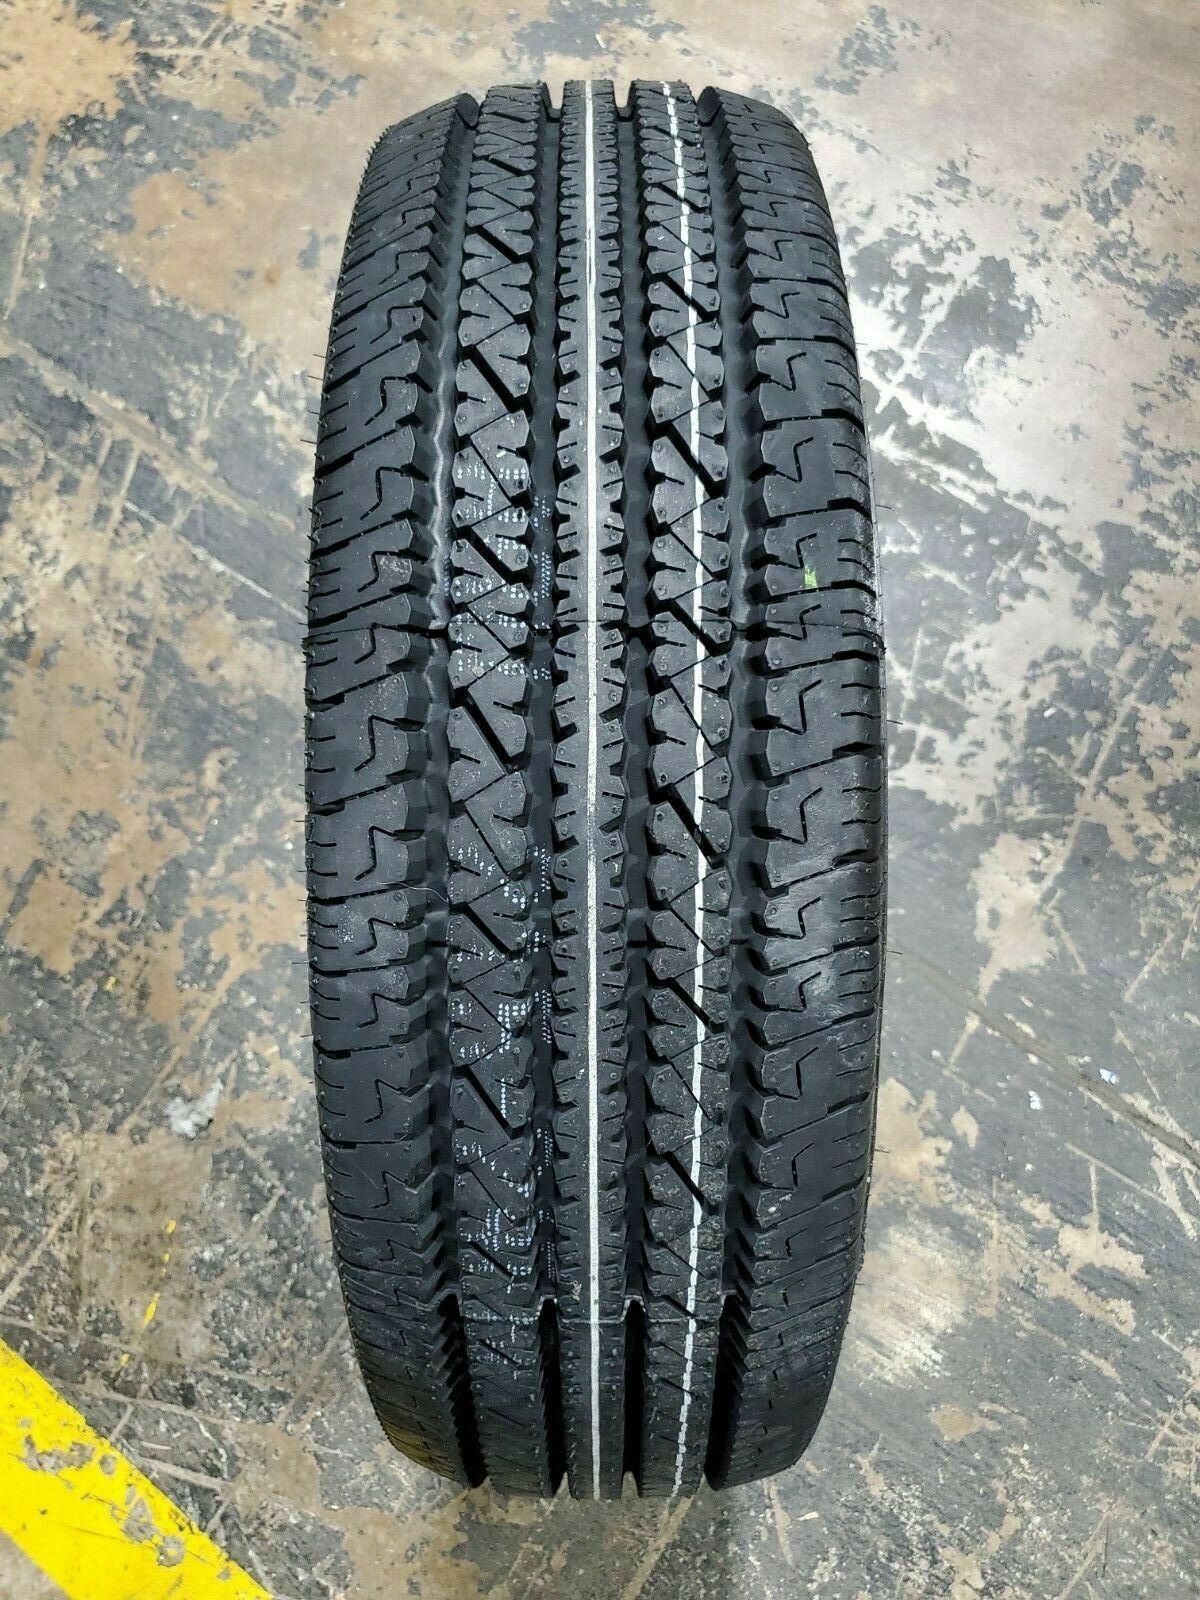 LT245/75R16 Bridgestone V-STEEL RIB 265 120/116S M+S 10PLY LOAD E 80PSI